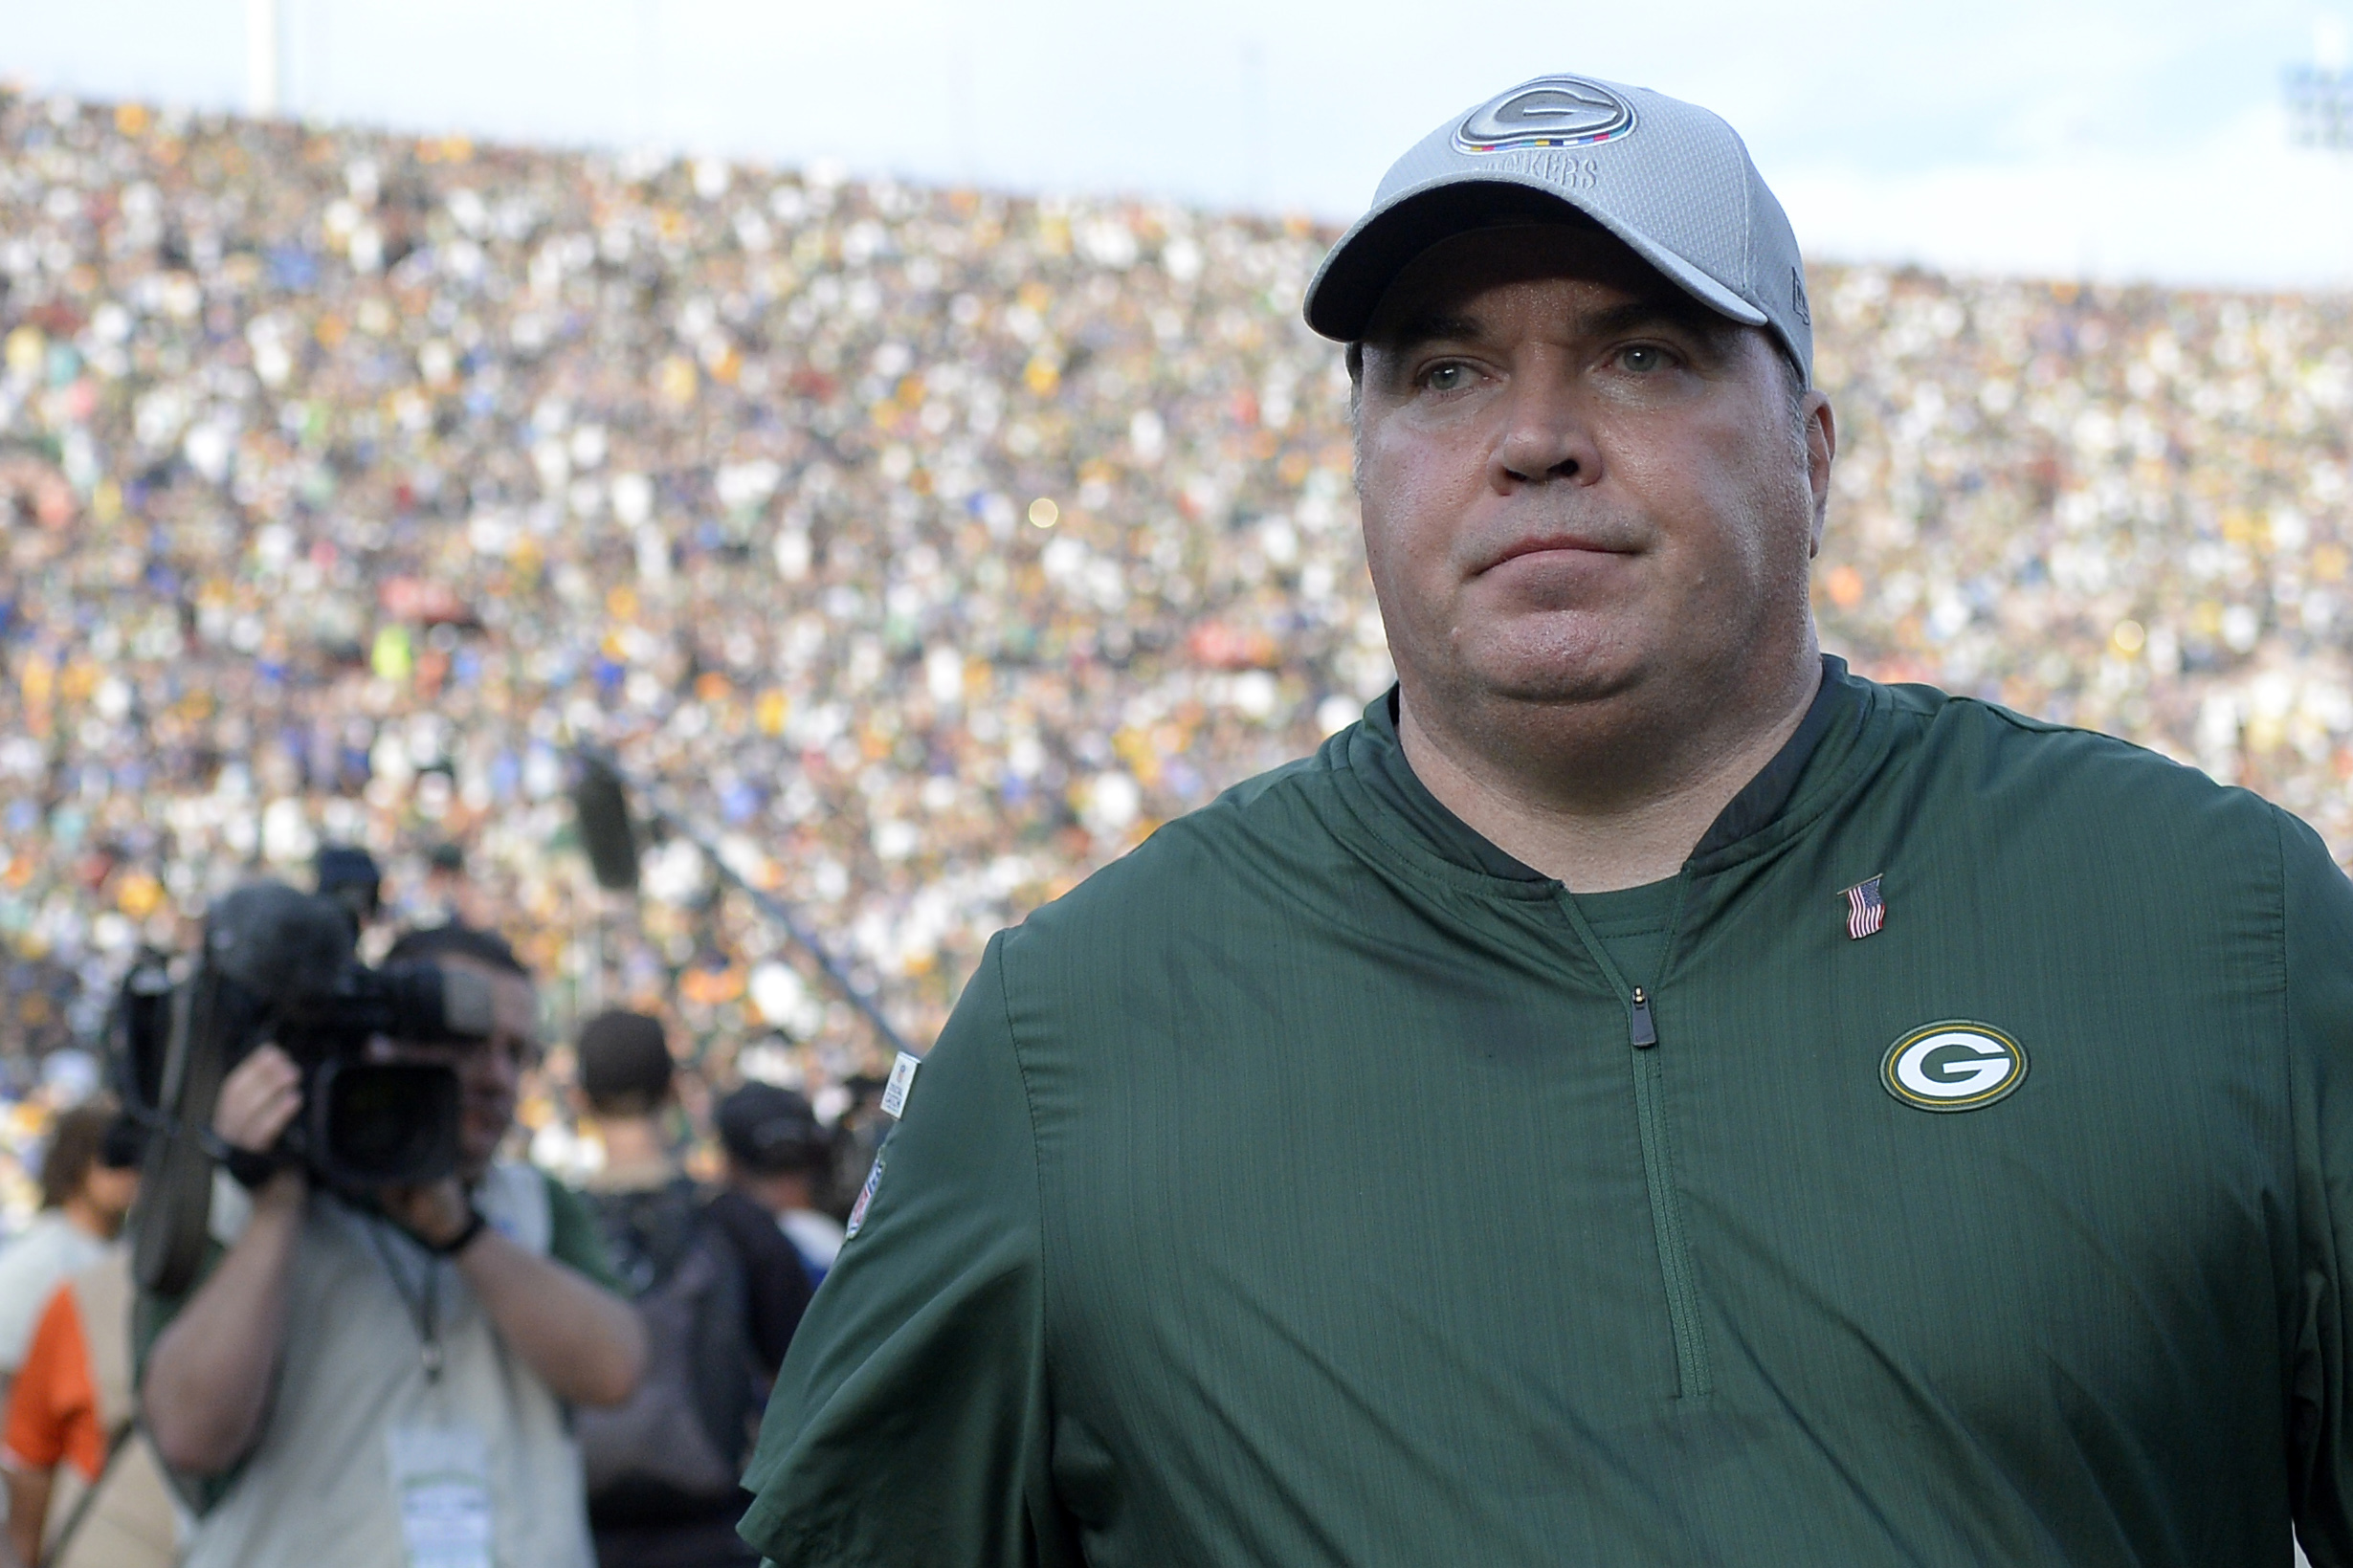 Arizona Cardinals rumors indicate Mike McCarthy could land head coaching job